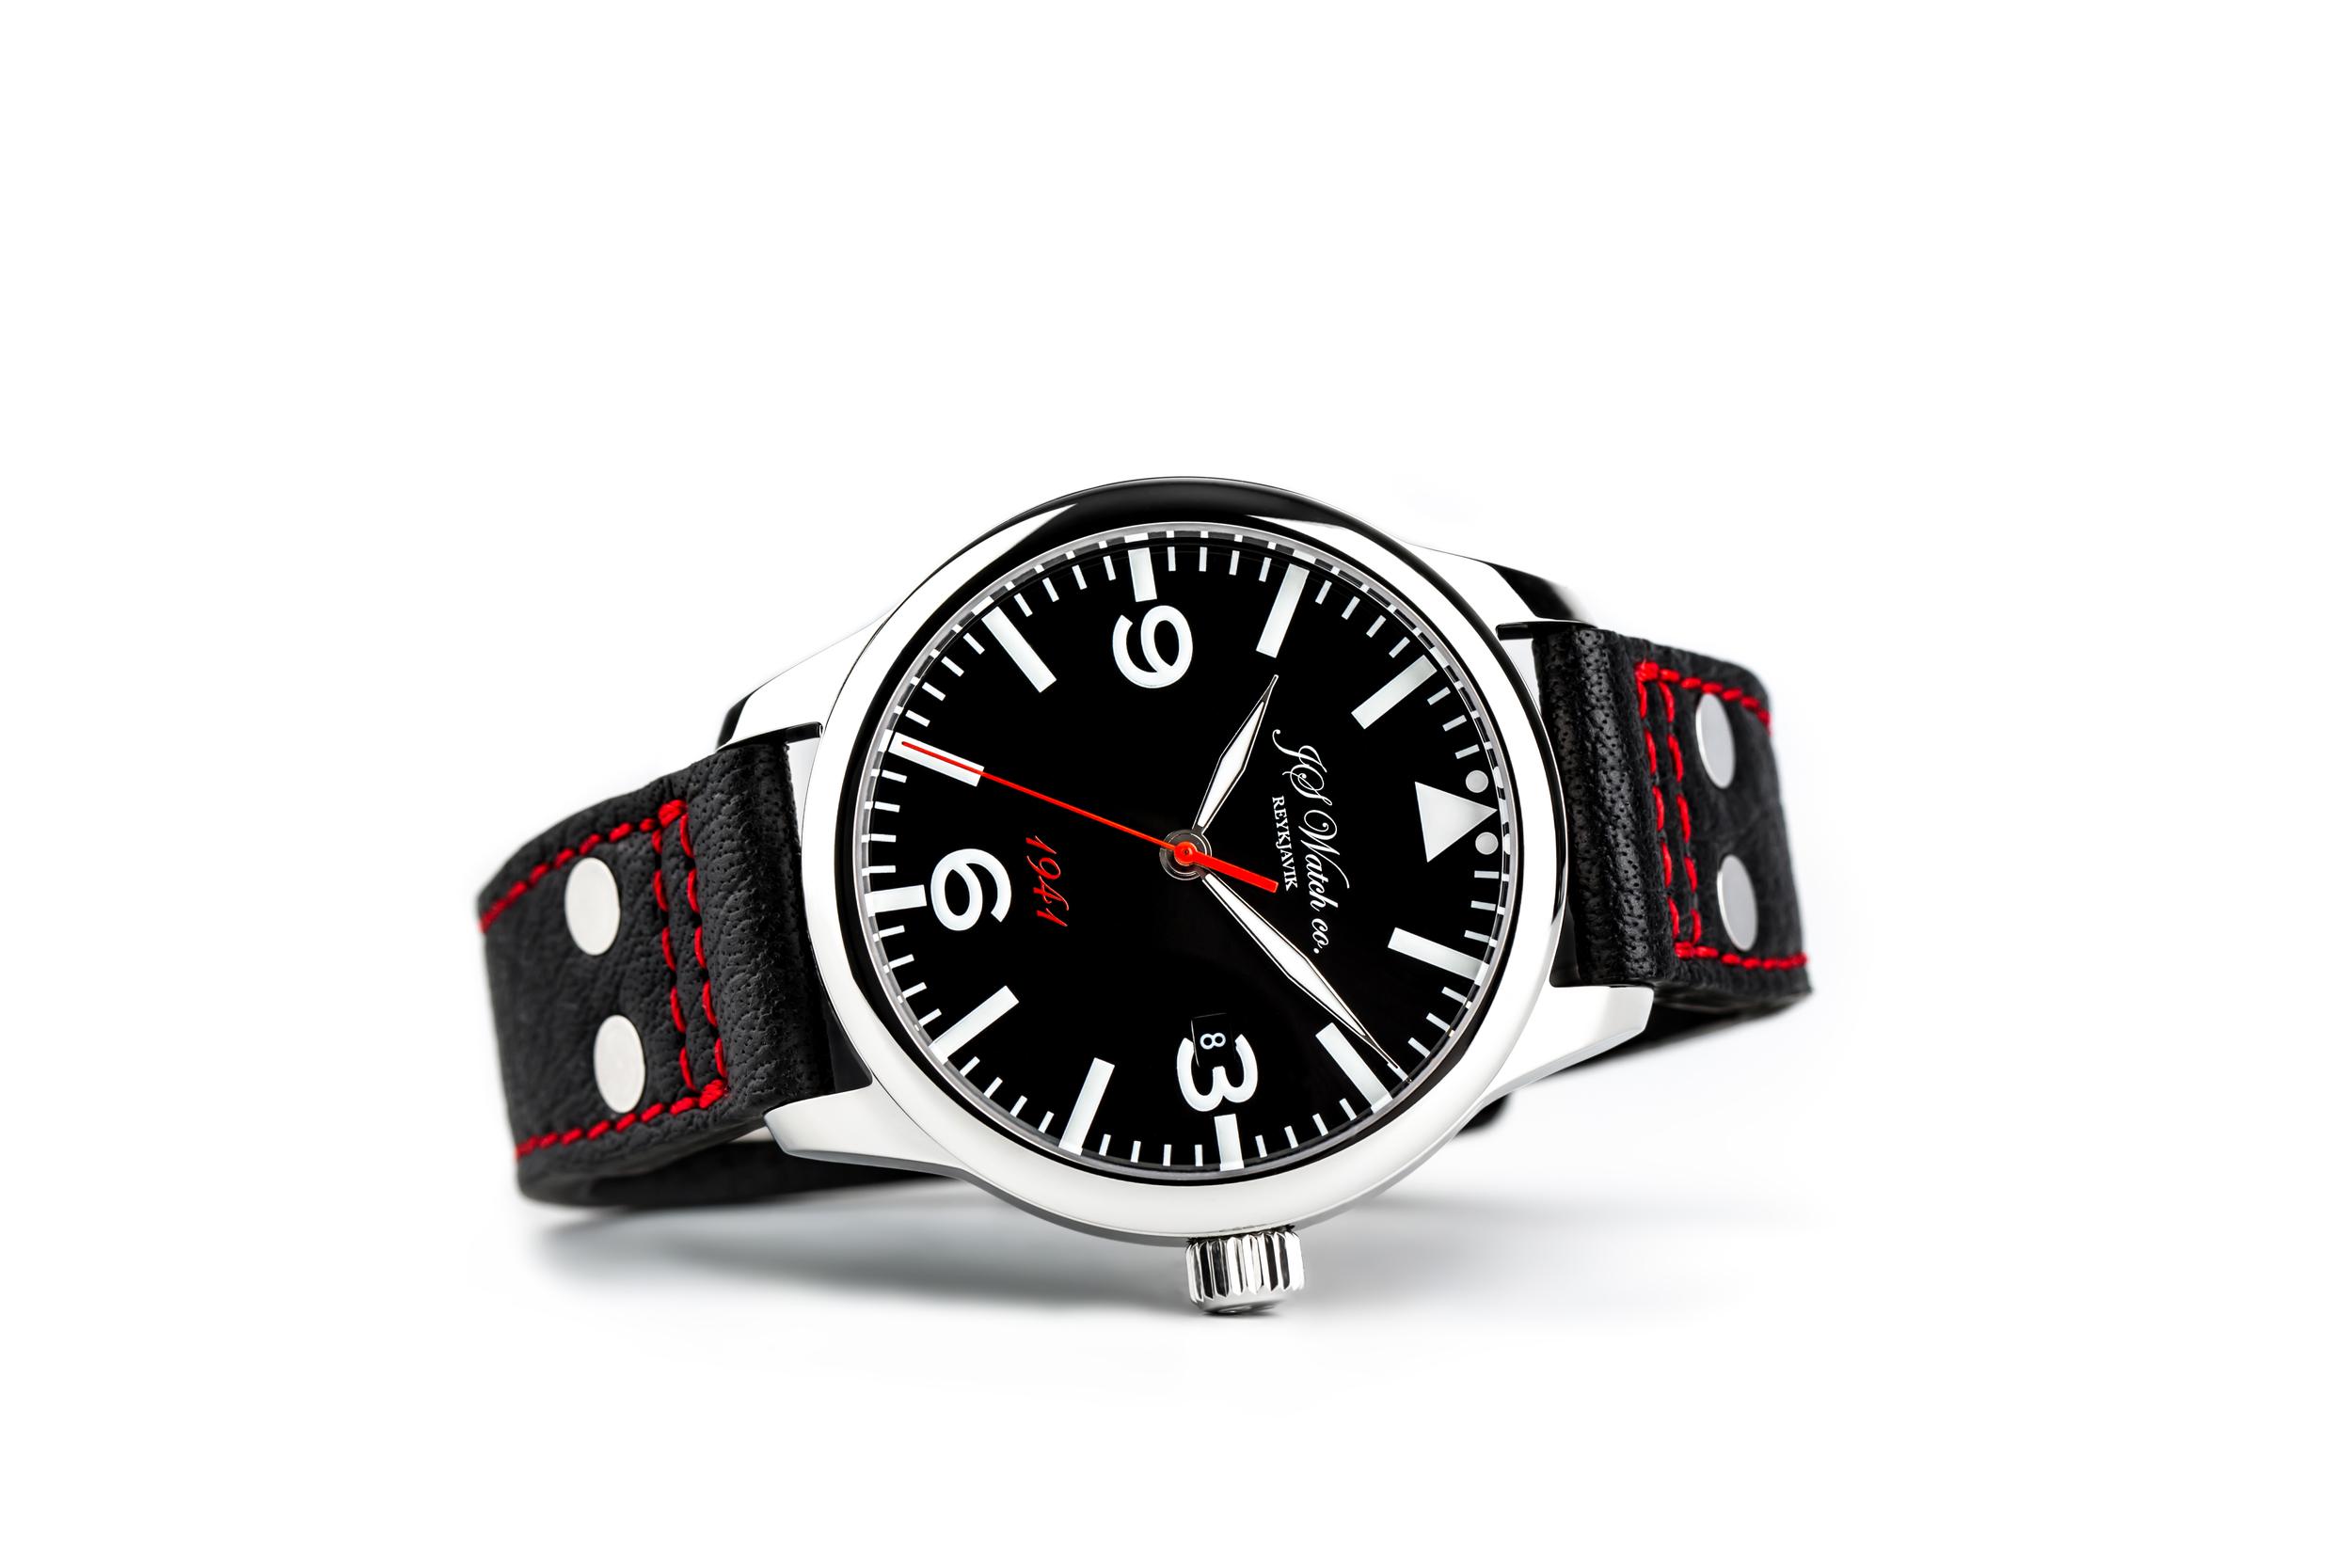 Frisland 1941 Pilot style watch